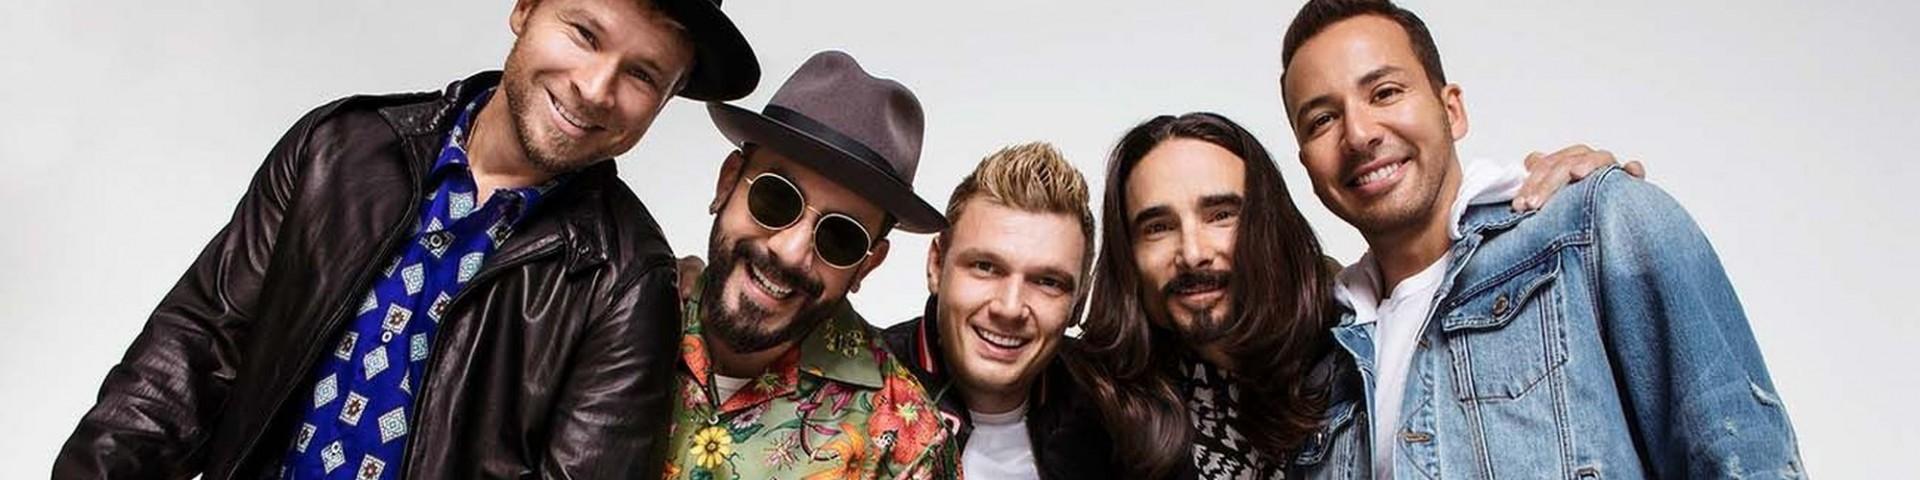 Backstreet Boys in concerto a Milano - 15 maggio